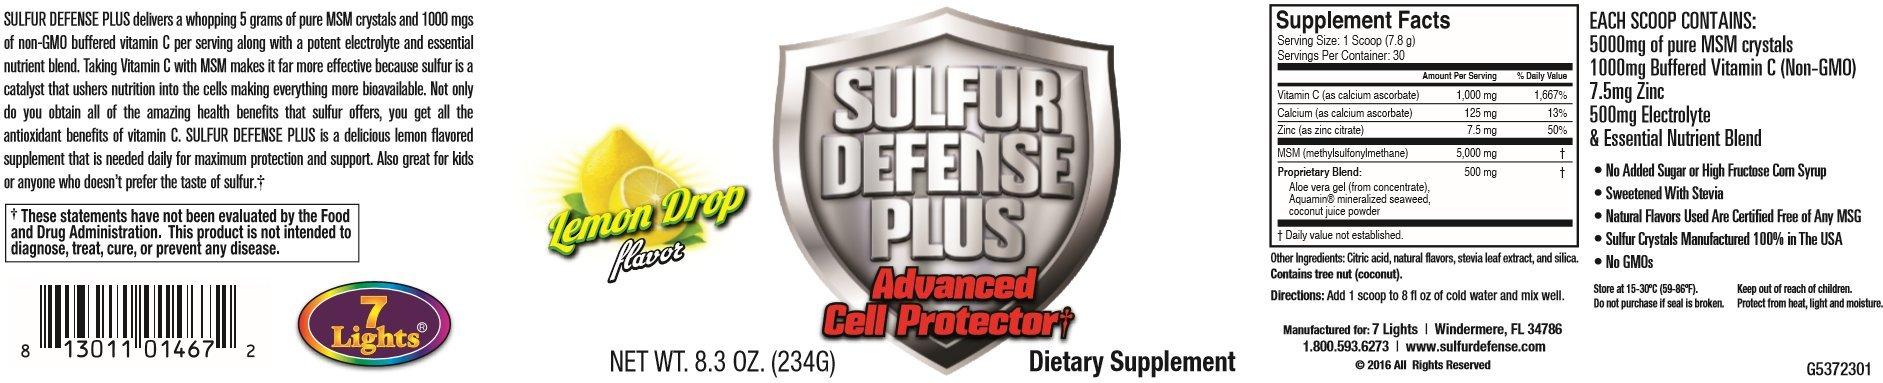 Sulfur Defense Plus (Organic Sulfur & Vitamin C) (3 Pack Special)